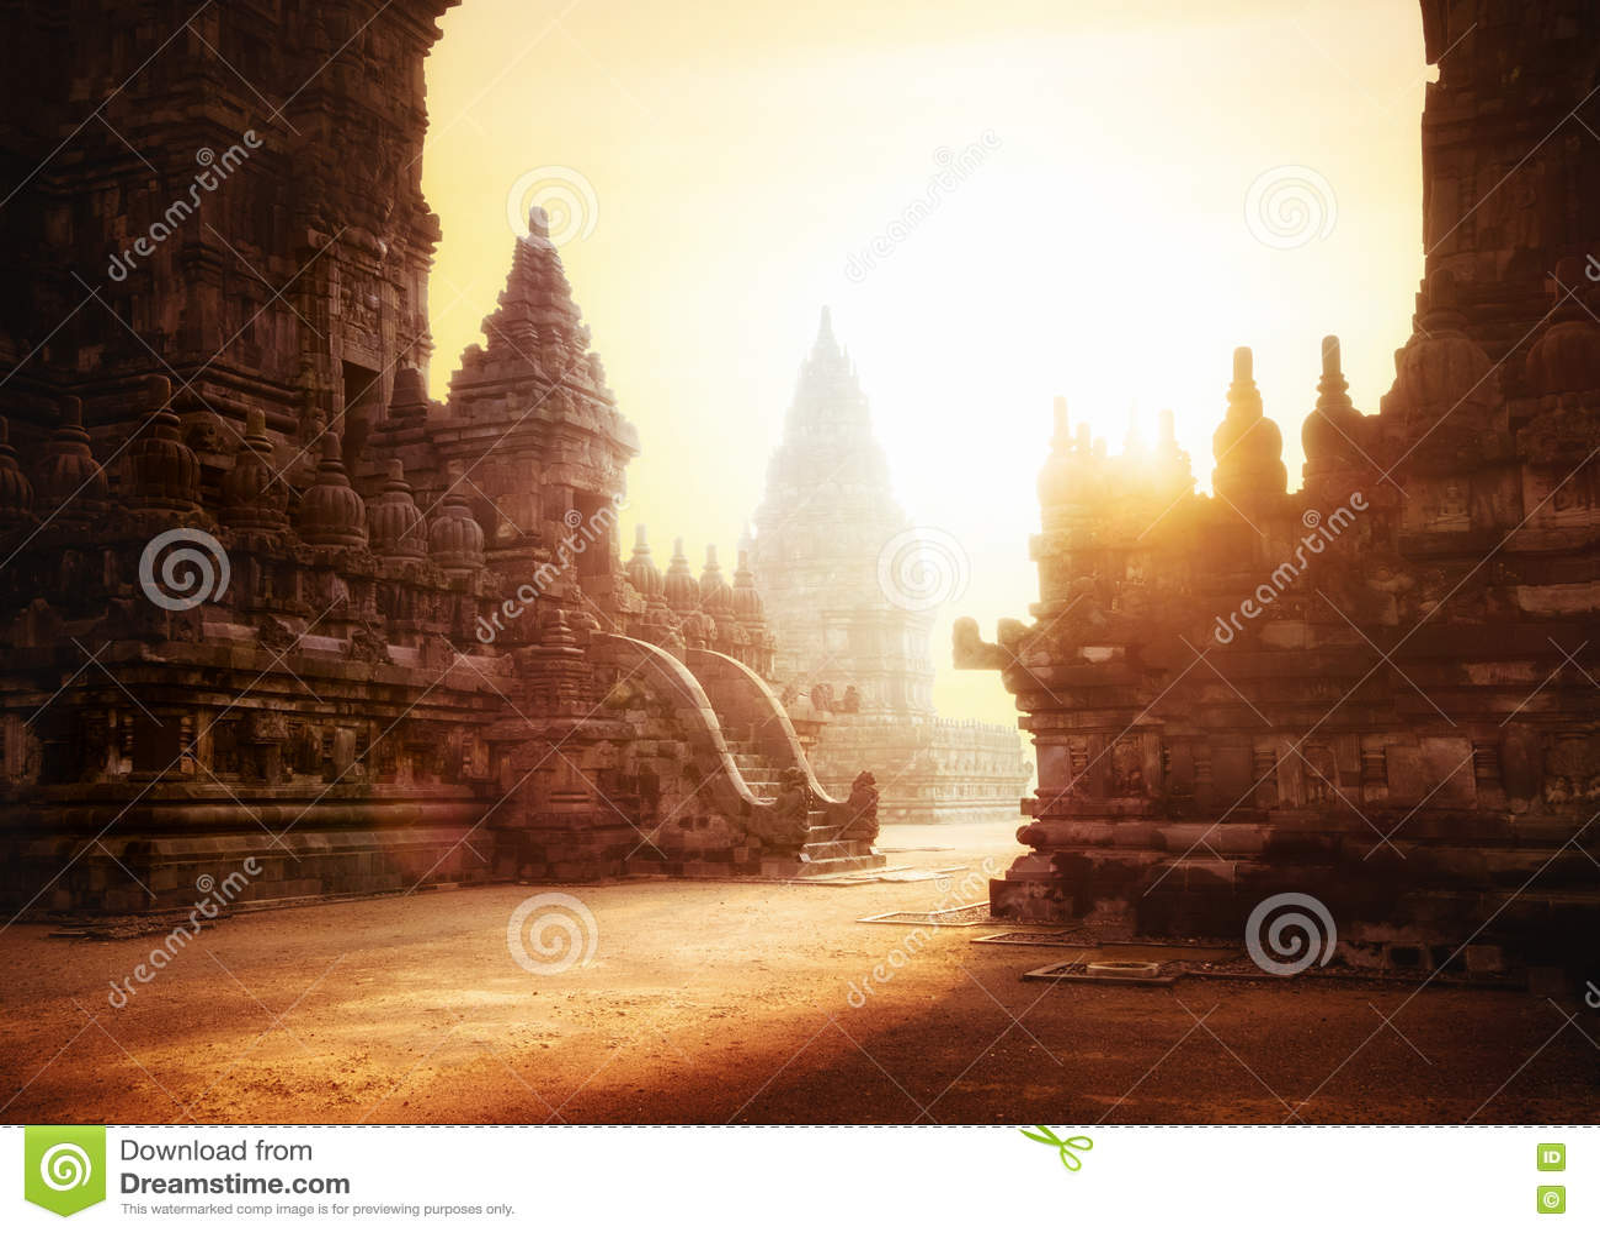 Lever de soleil au temple hindou de Prambanan Java, Indonésie